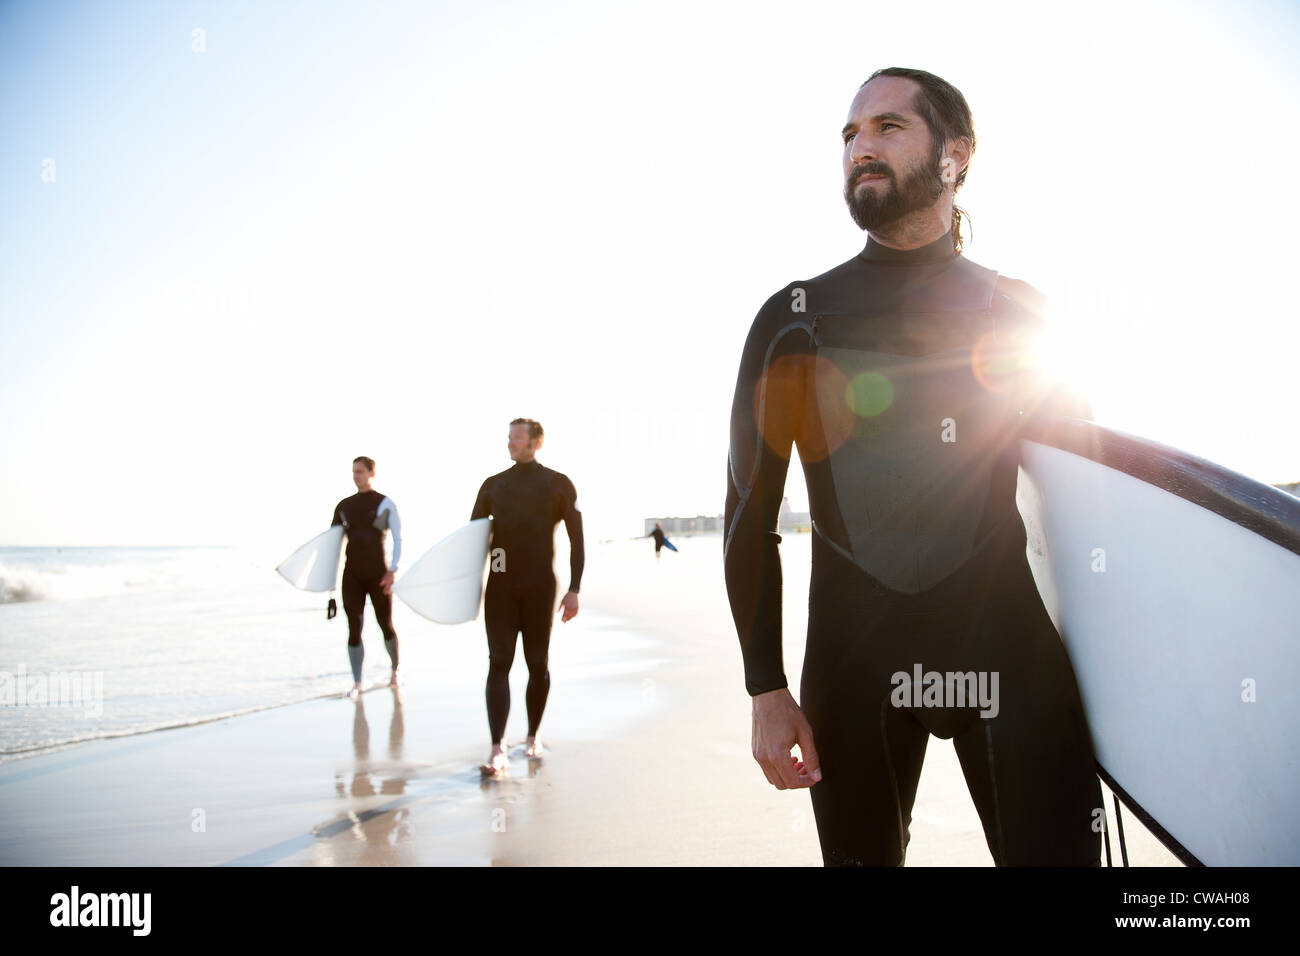 Three surfers at beach - Stock Image